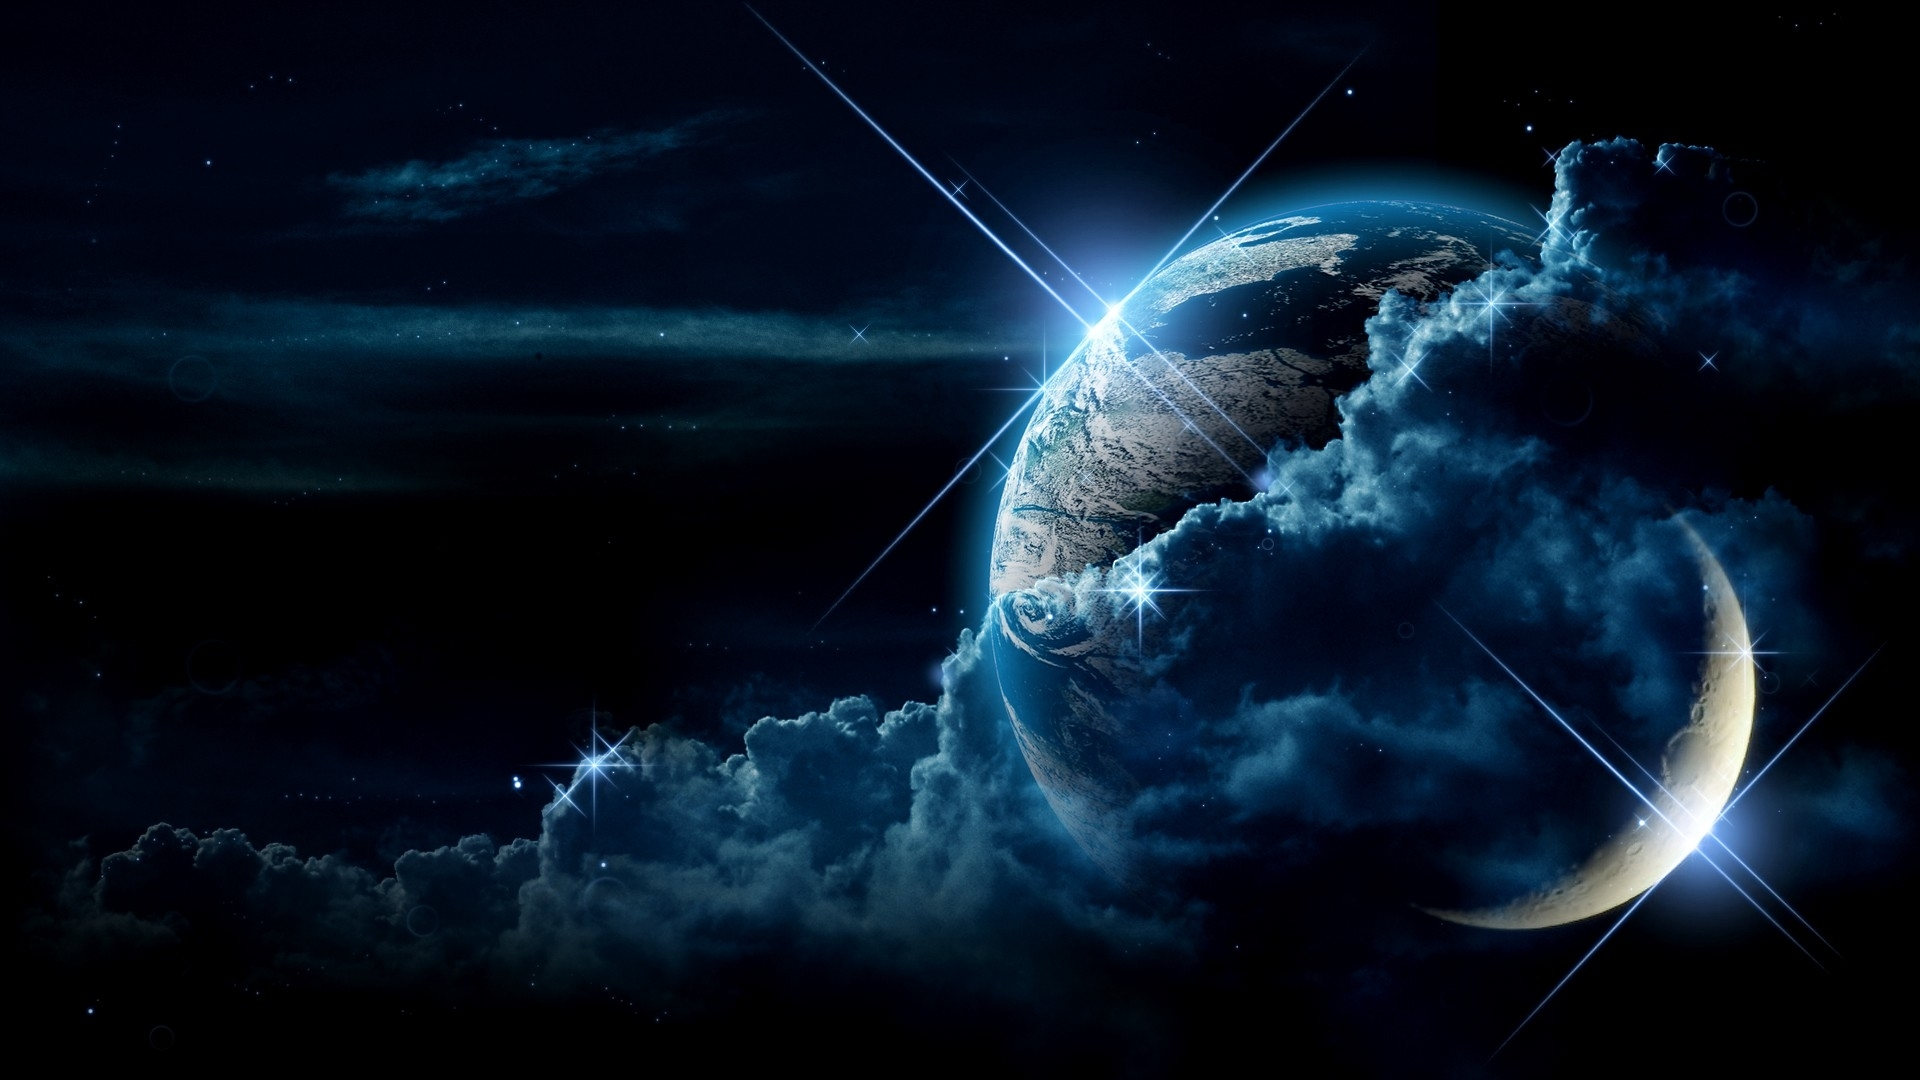 earth planet sci fi stars wallpaper 1920x1080 85386 WallpaperUP 1920x1080